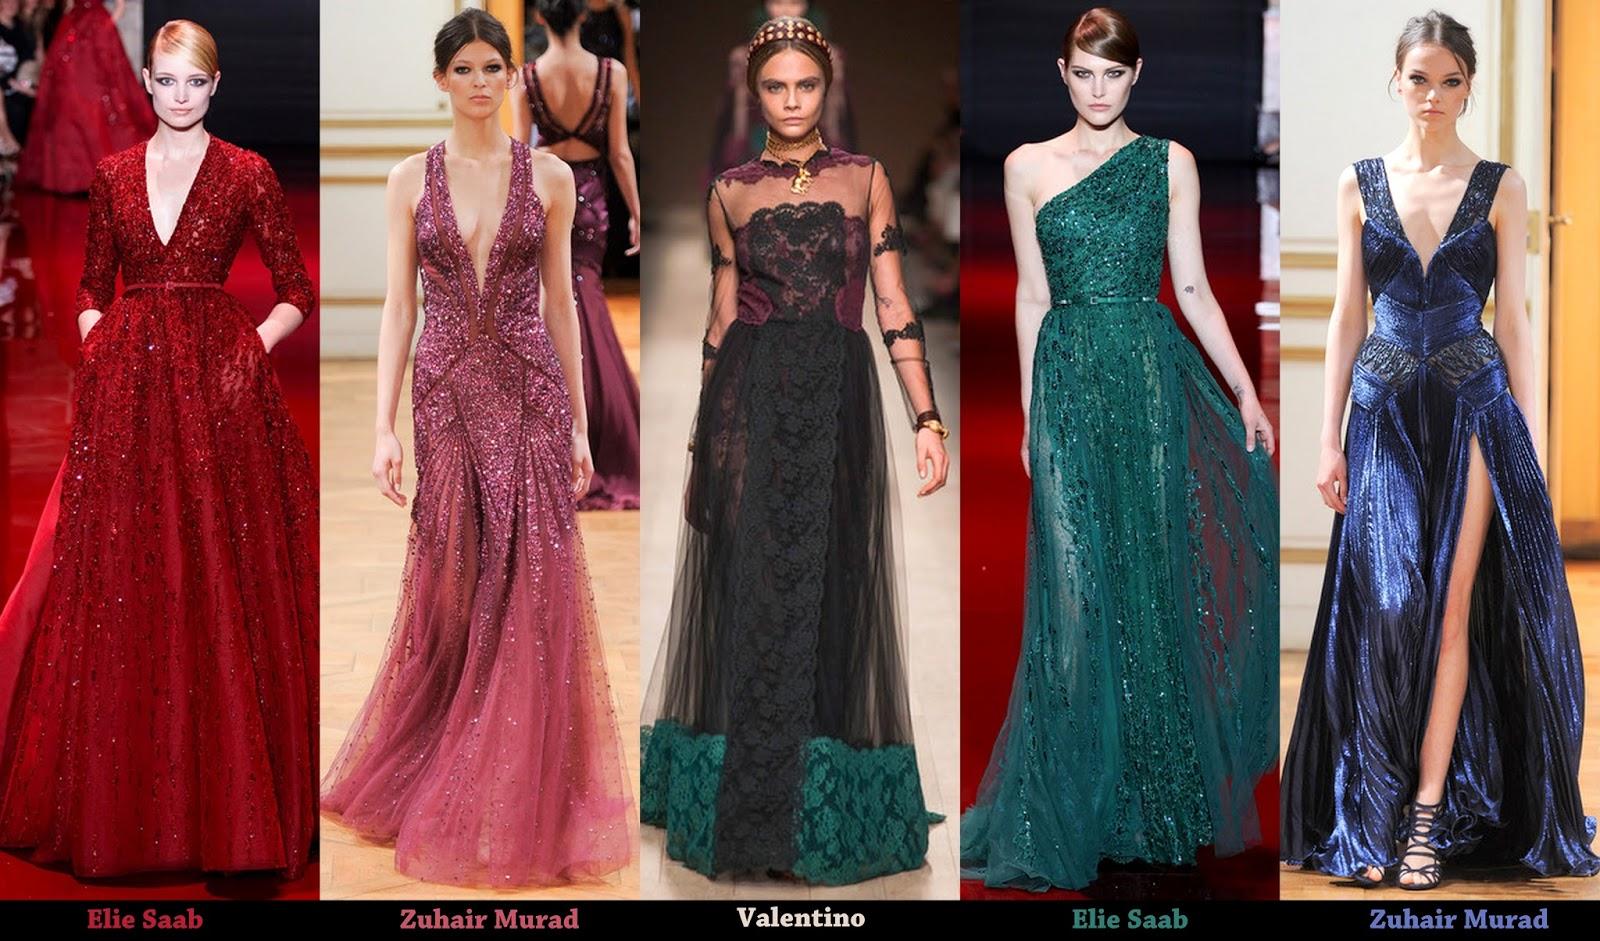 Valentino Evening Dresses 2014   Dress images